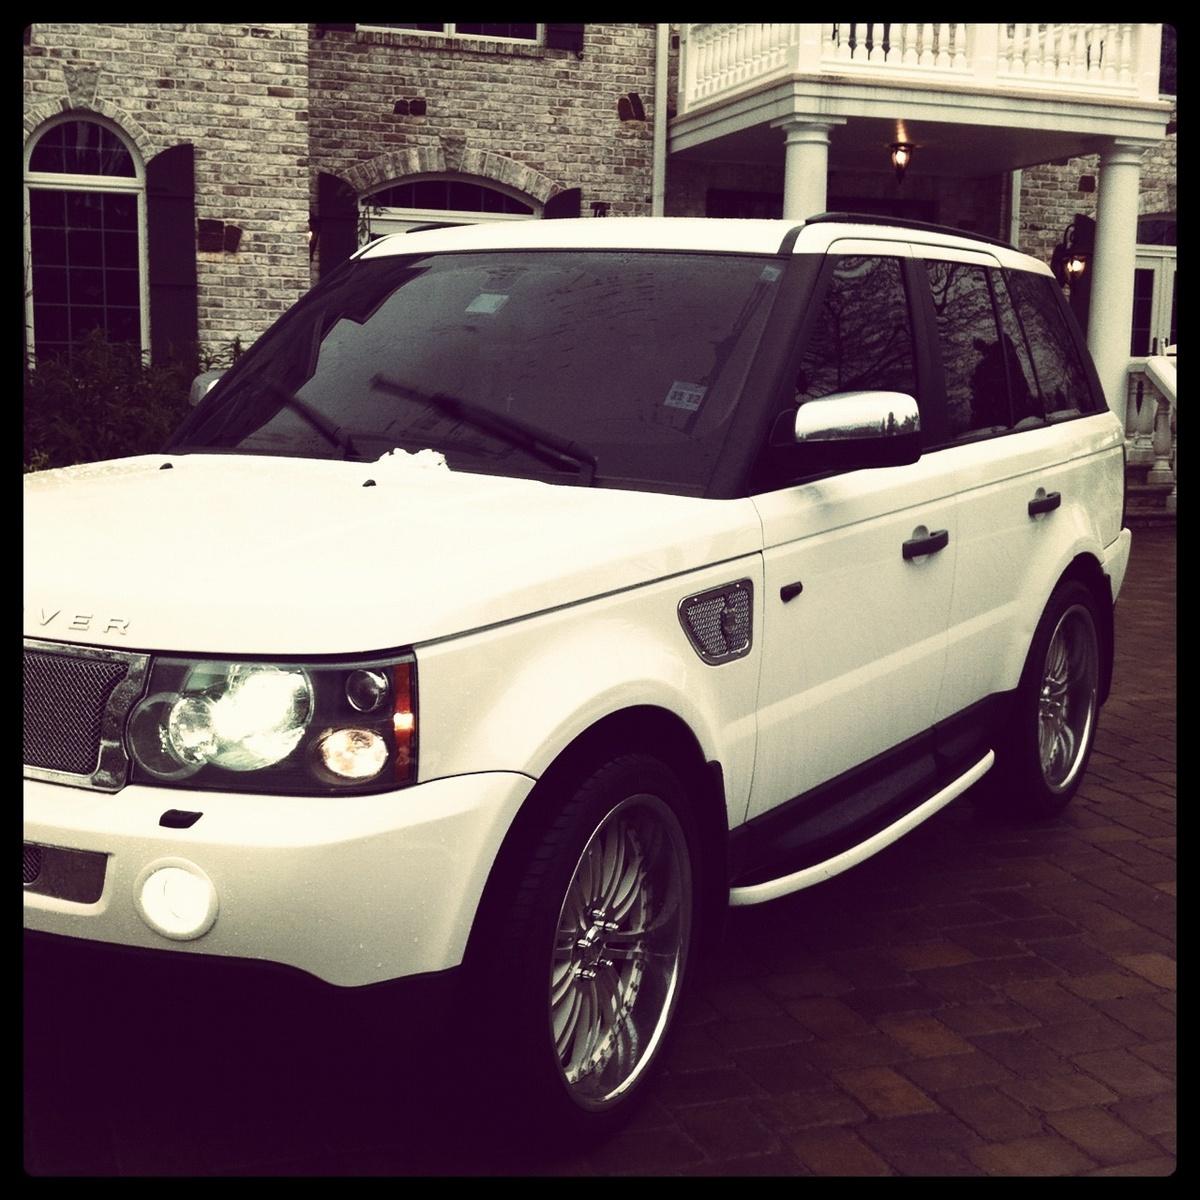 2008 Land Rover Range Rover Sport Interior: 2007 Land Rover Range Rover Sport